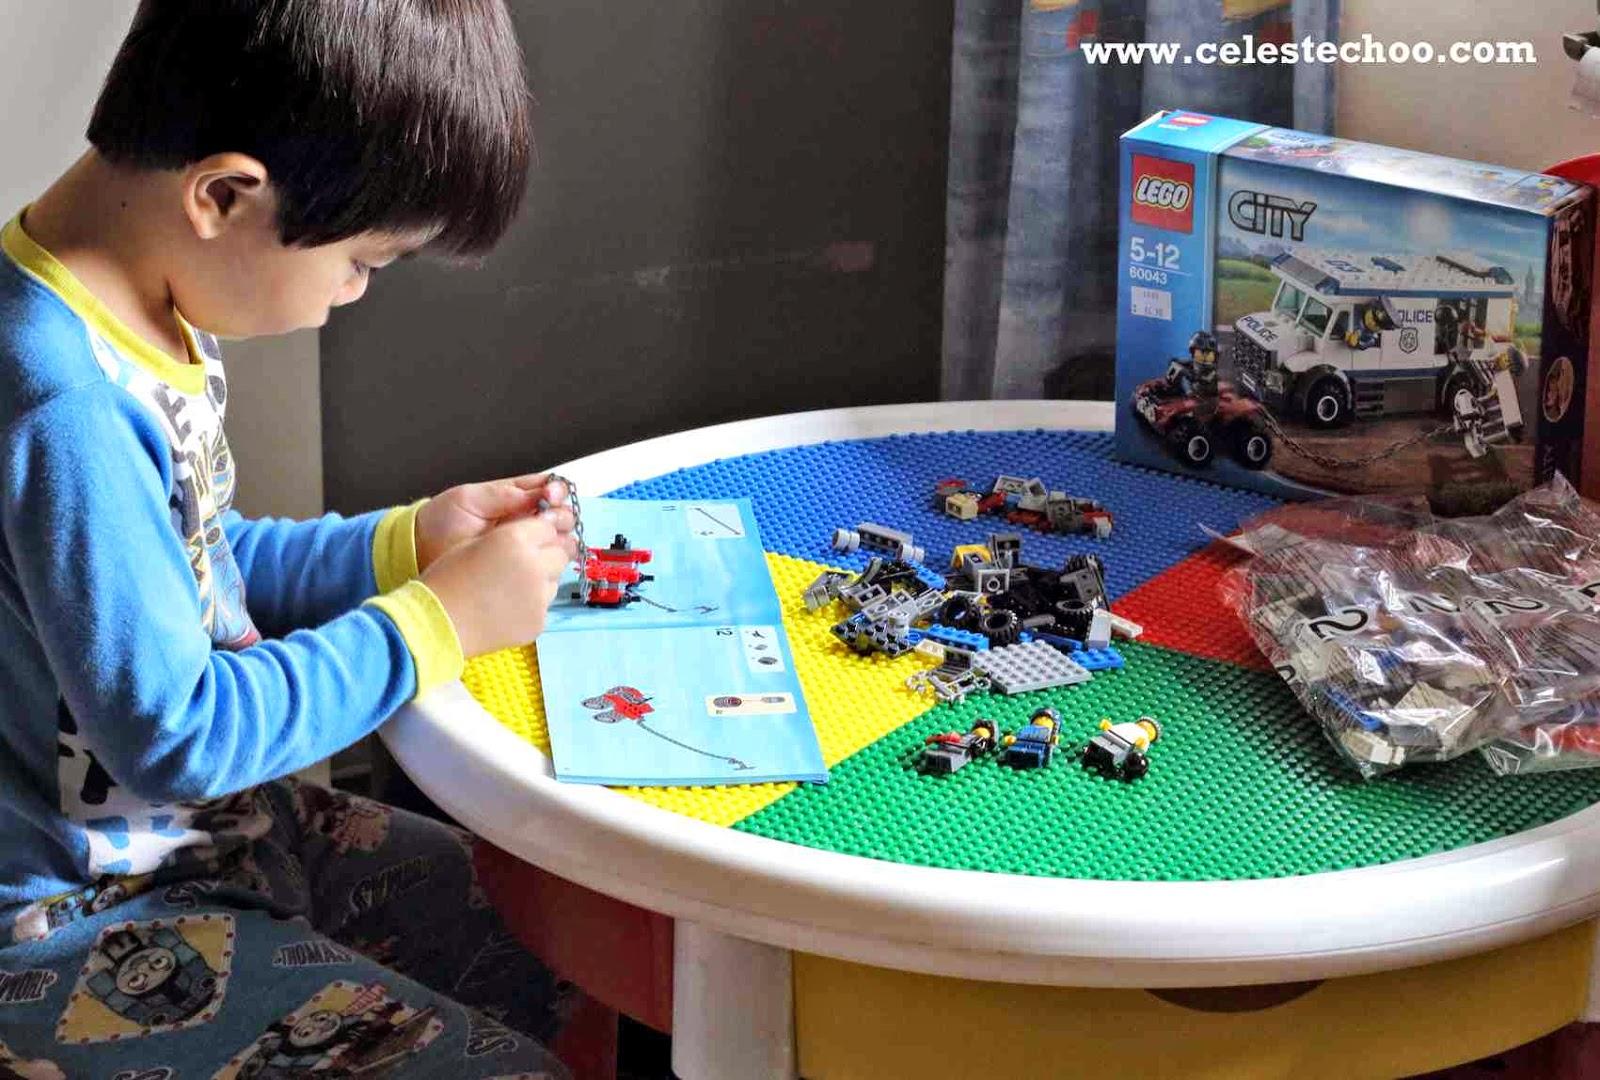 Lego City Police Truck For 5 12 Years Old Celeste Choo